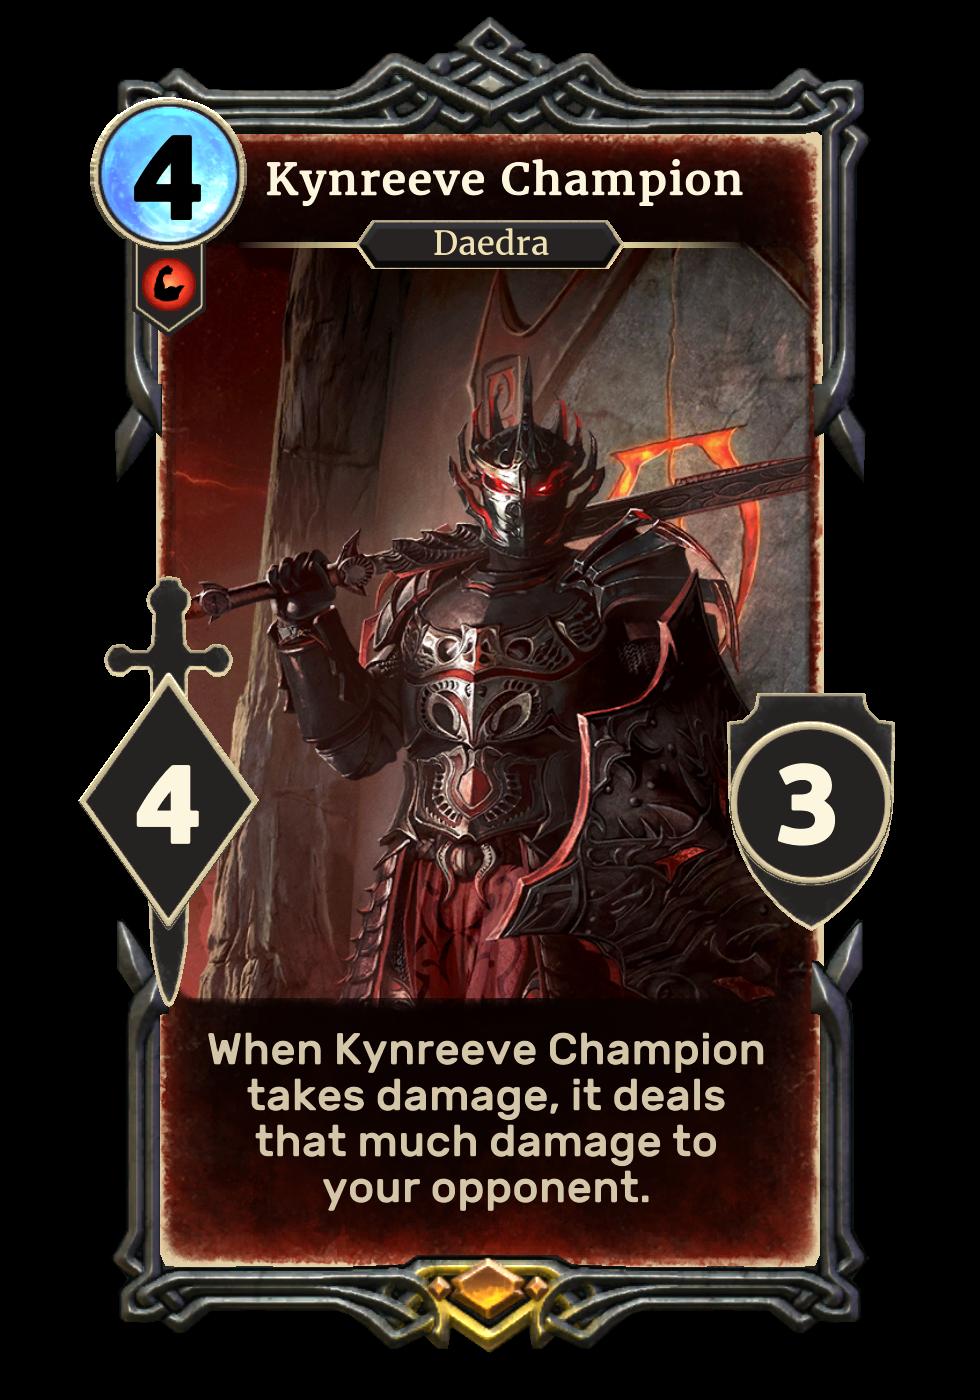 Kynreeve Champion